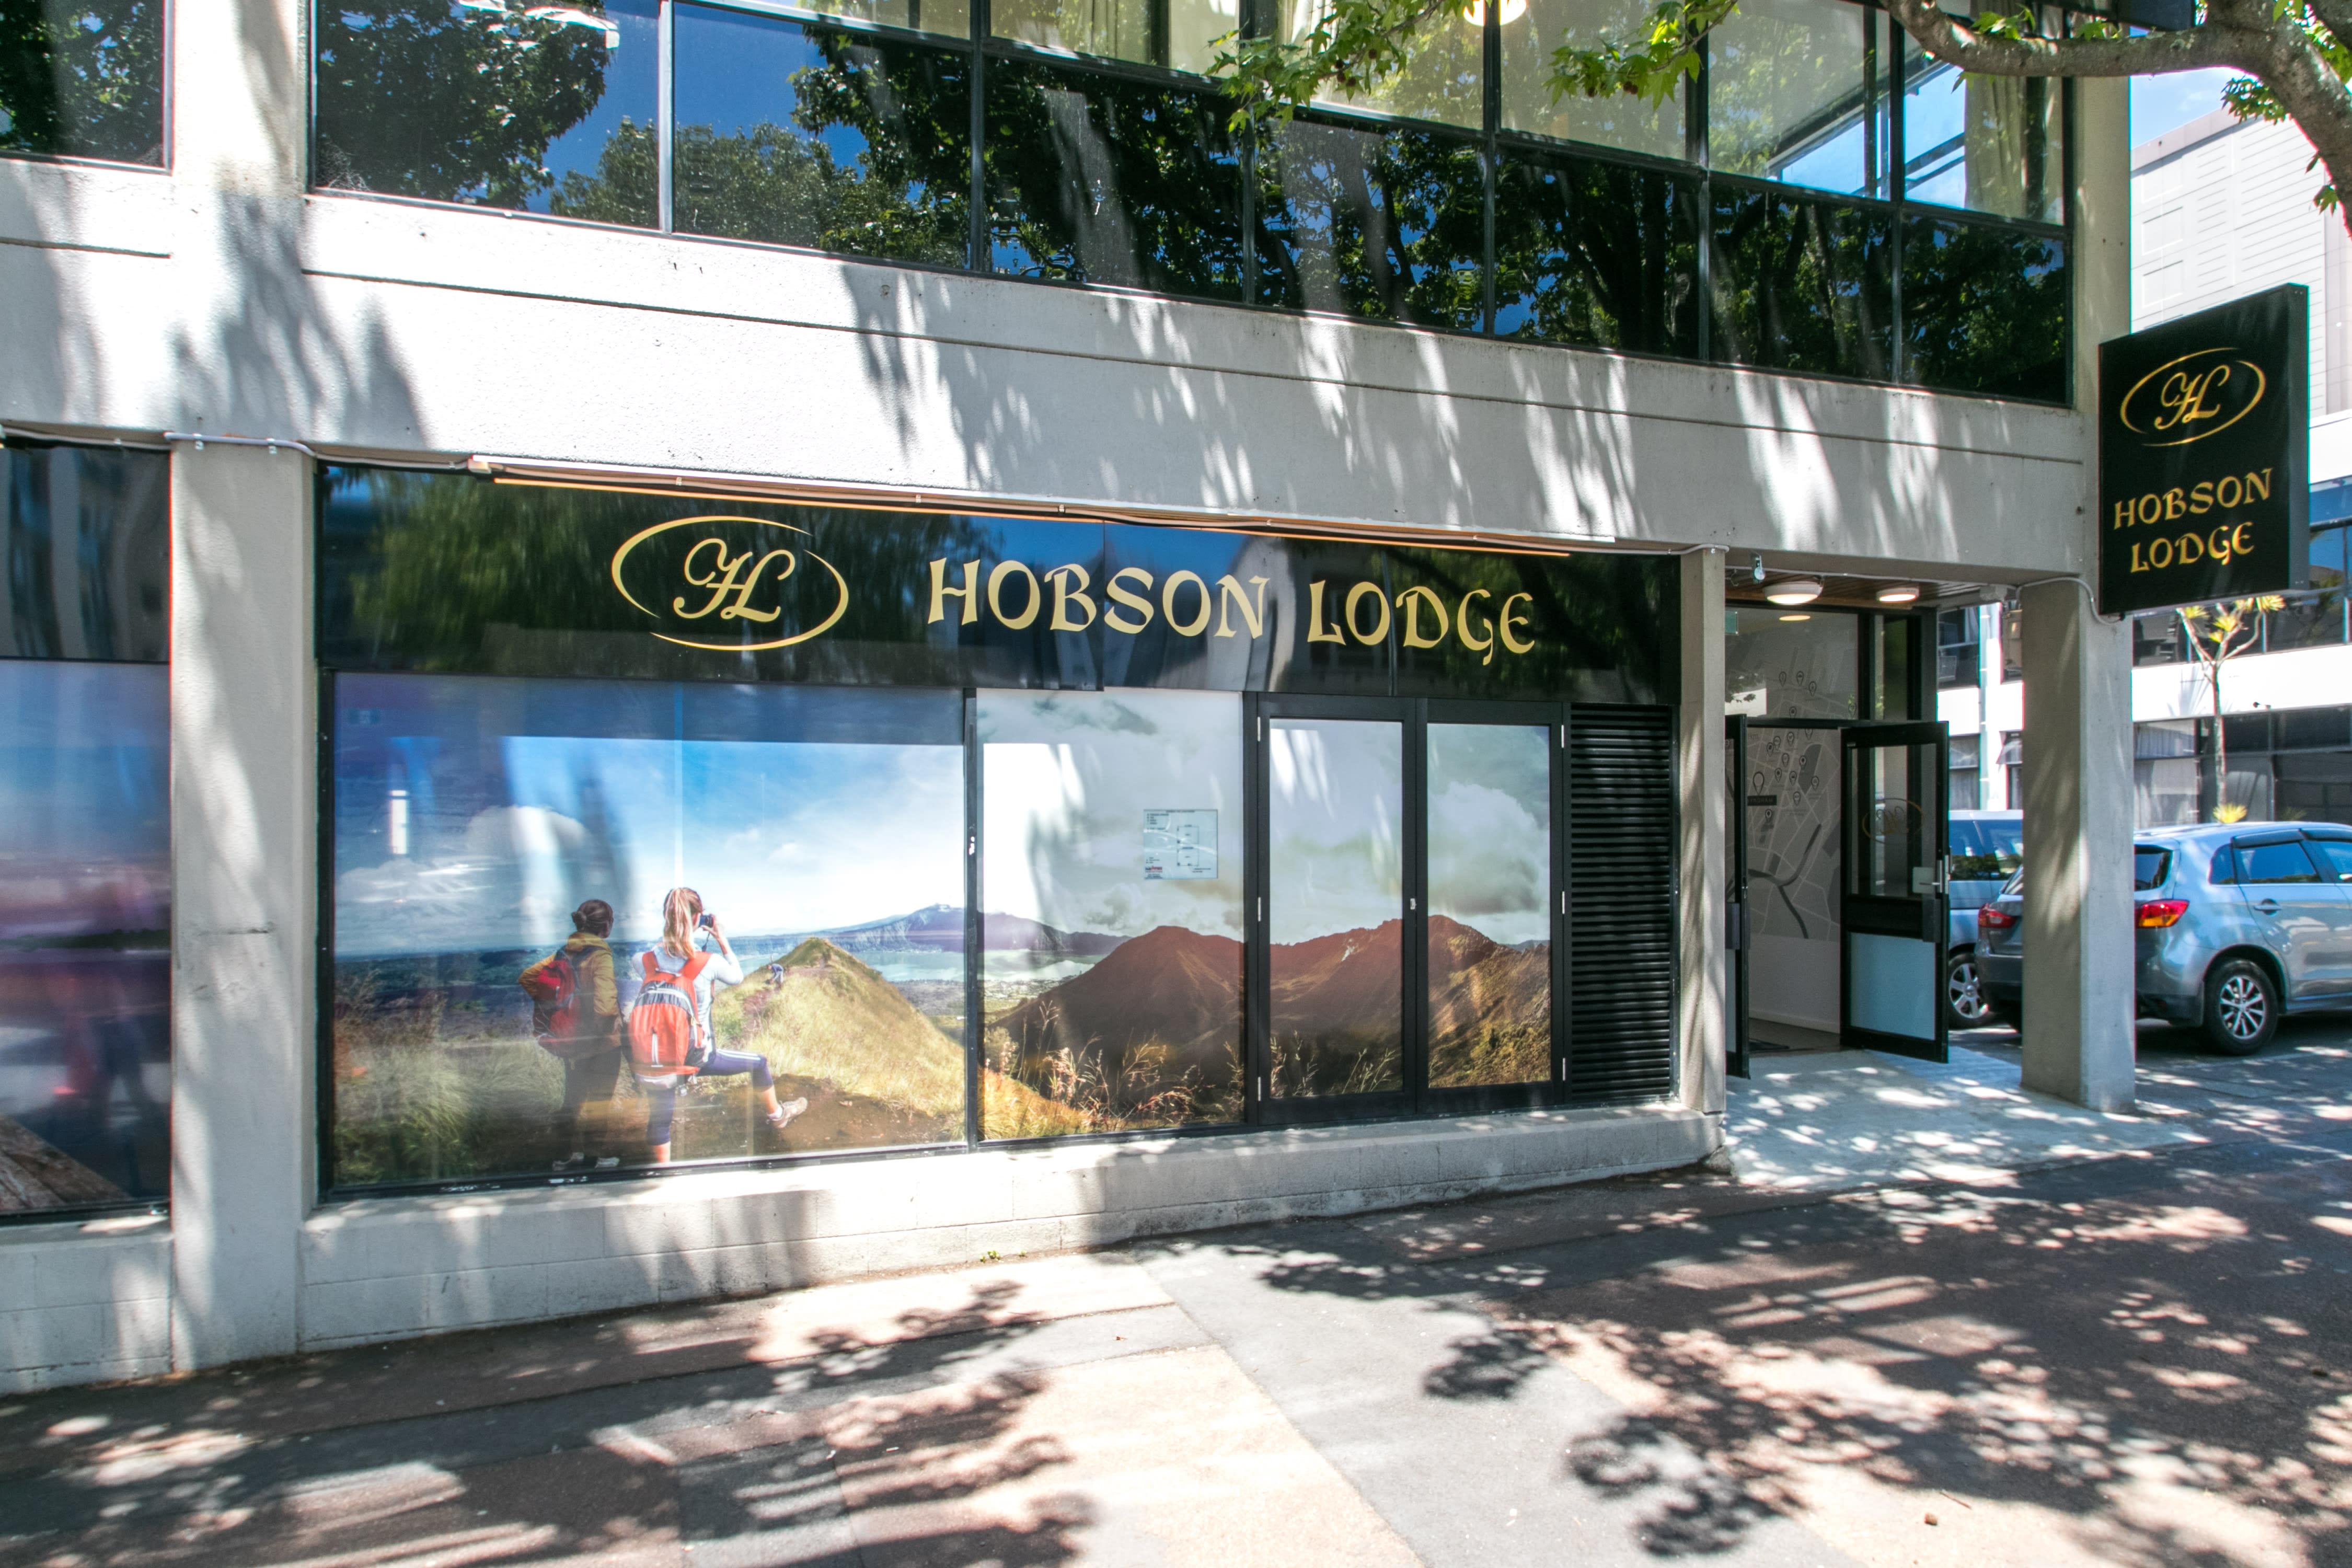 HOSTEL - Hobson Lodge